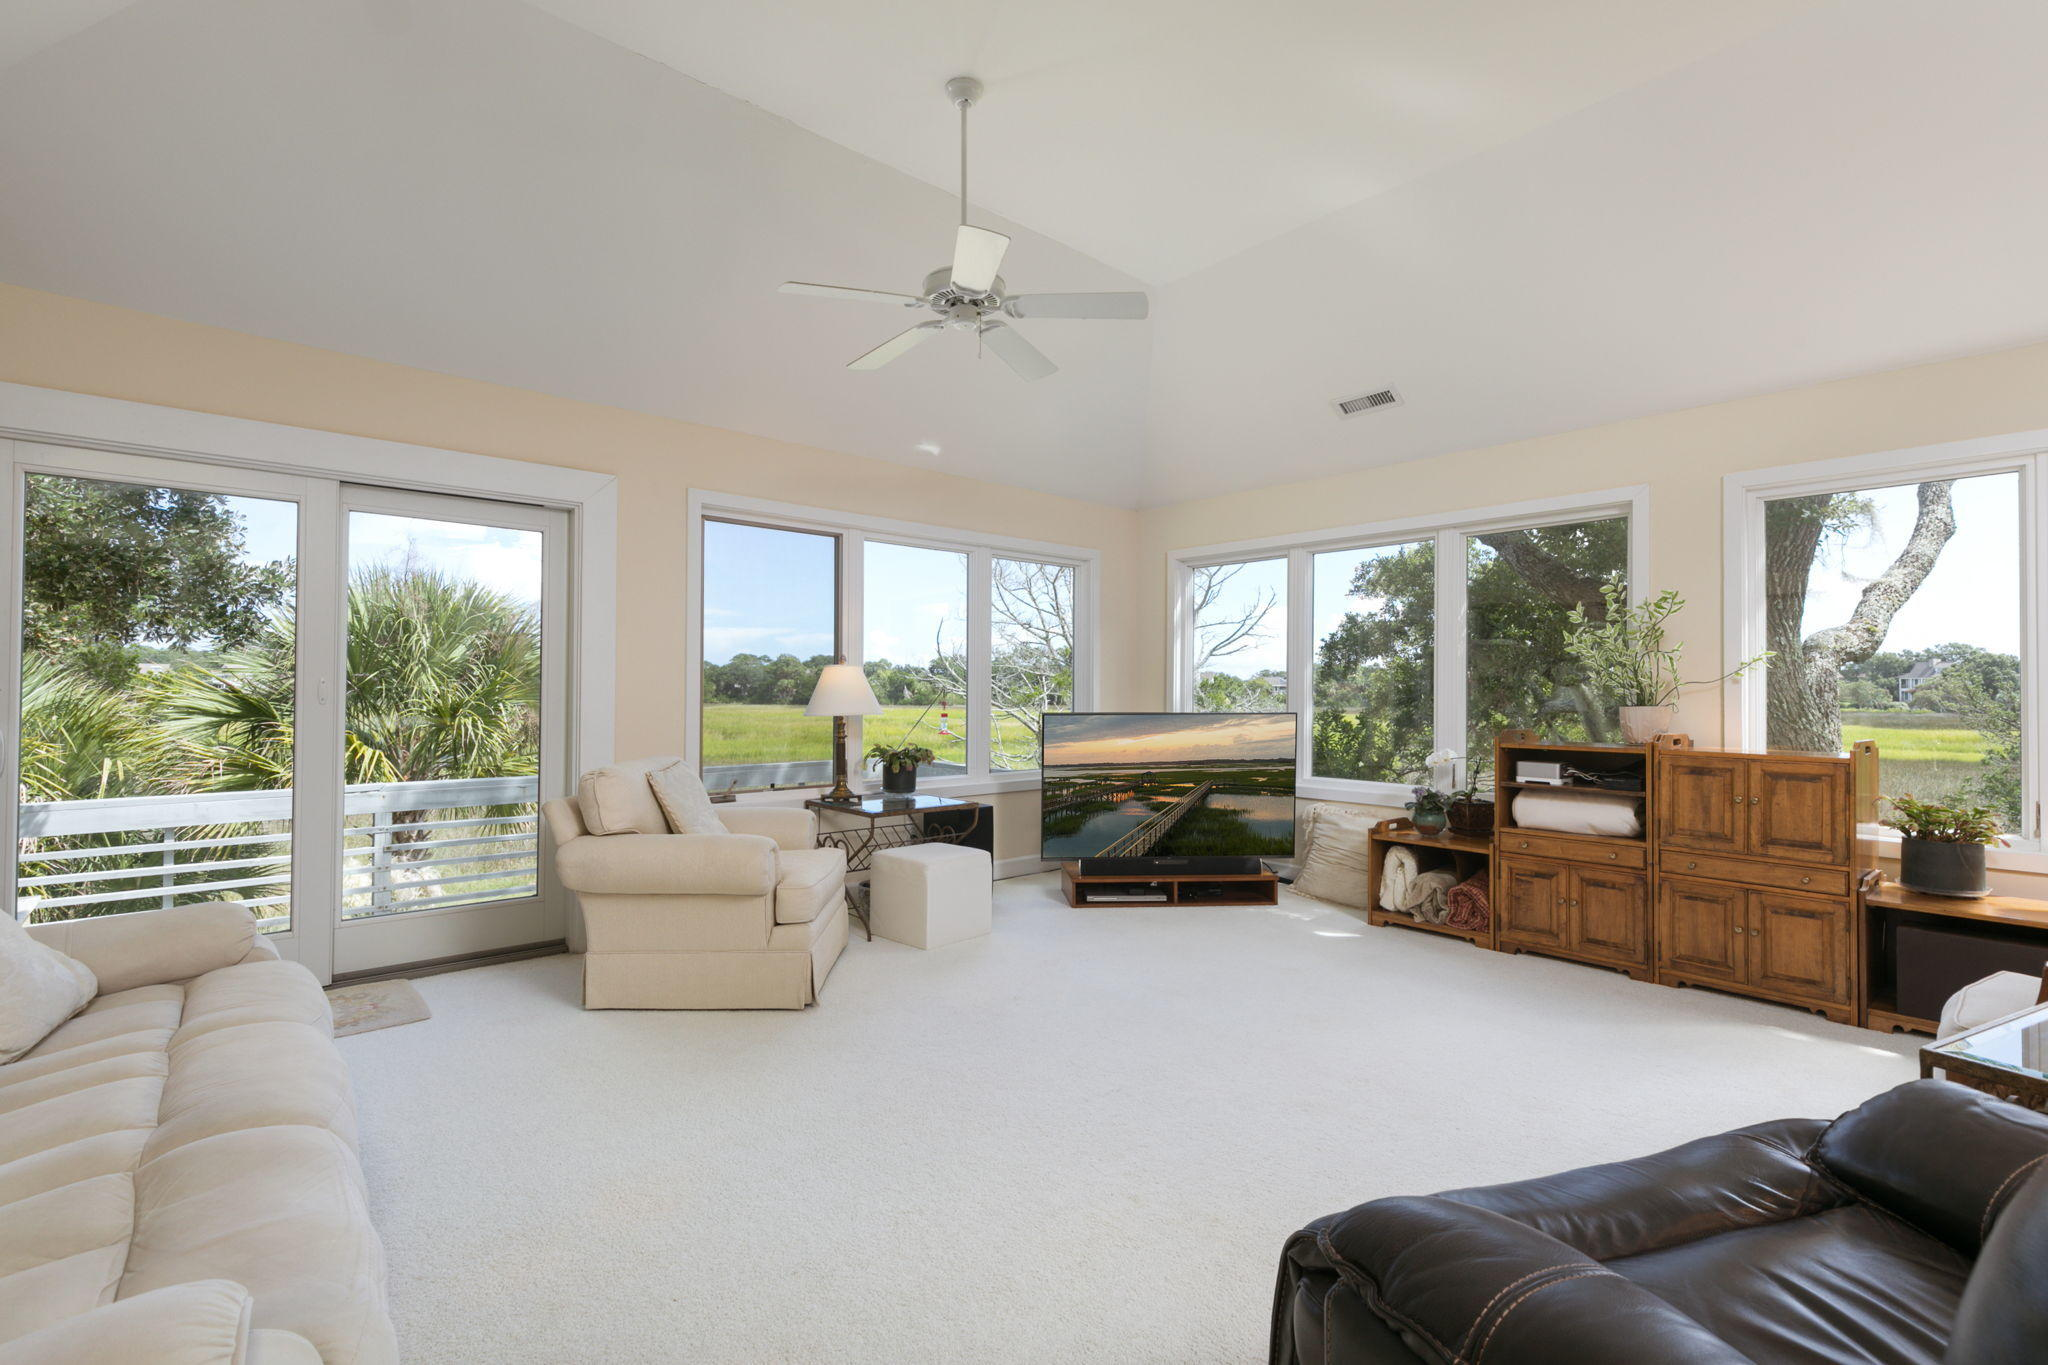 Seabrook Island Homes For Sale - 3360 Seabrook Island, Seabrook Island, SC - 9